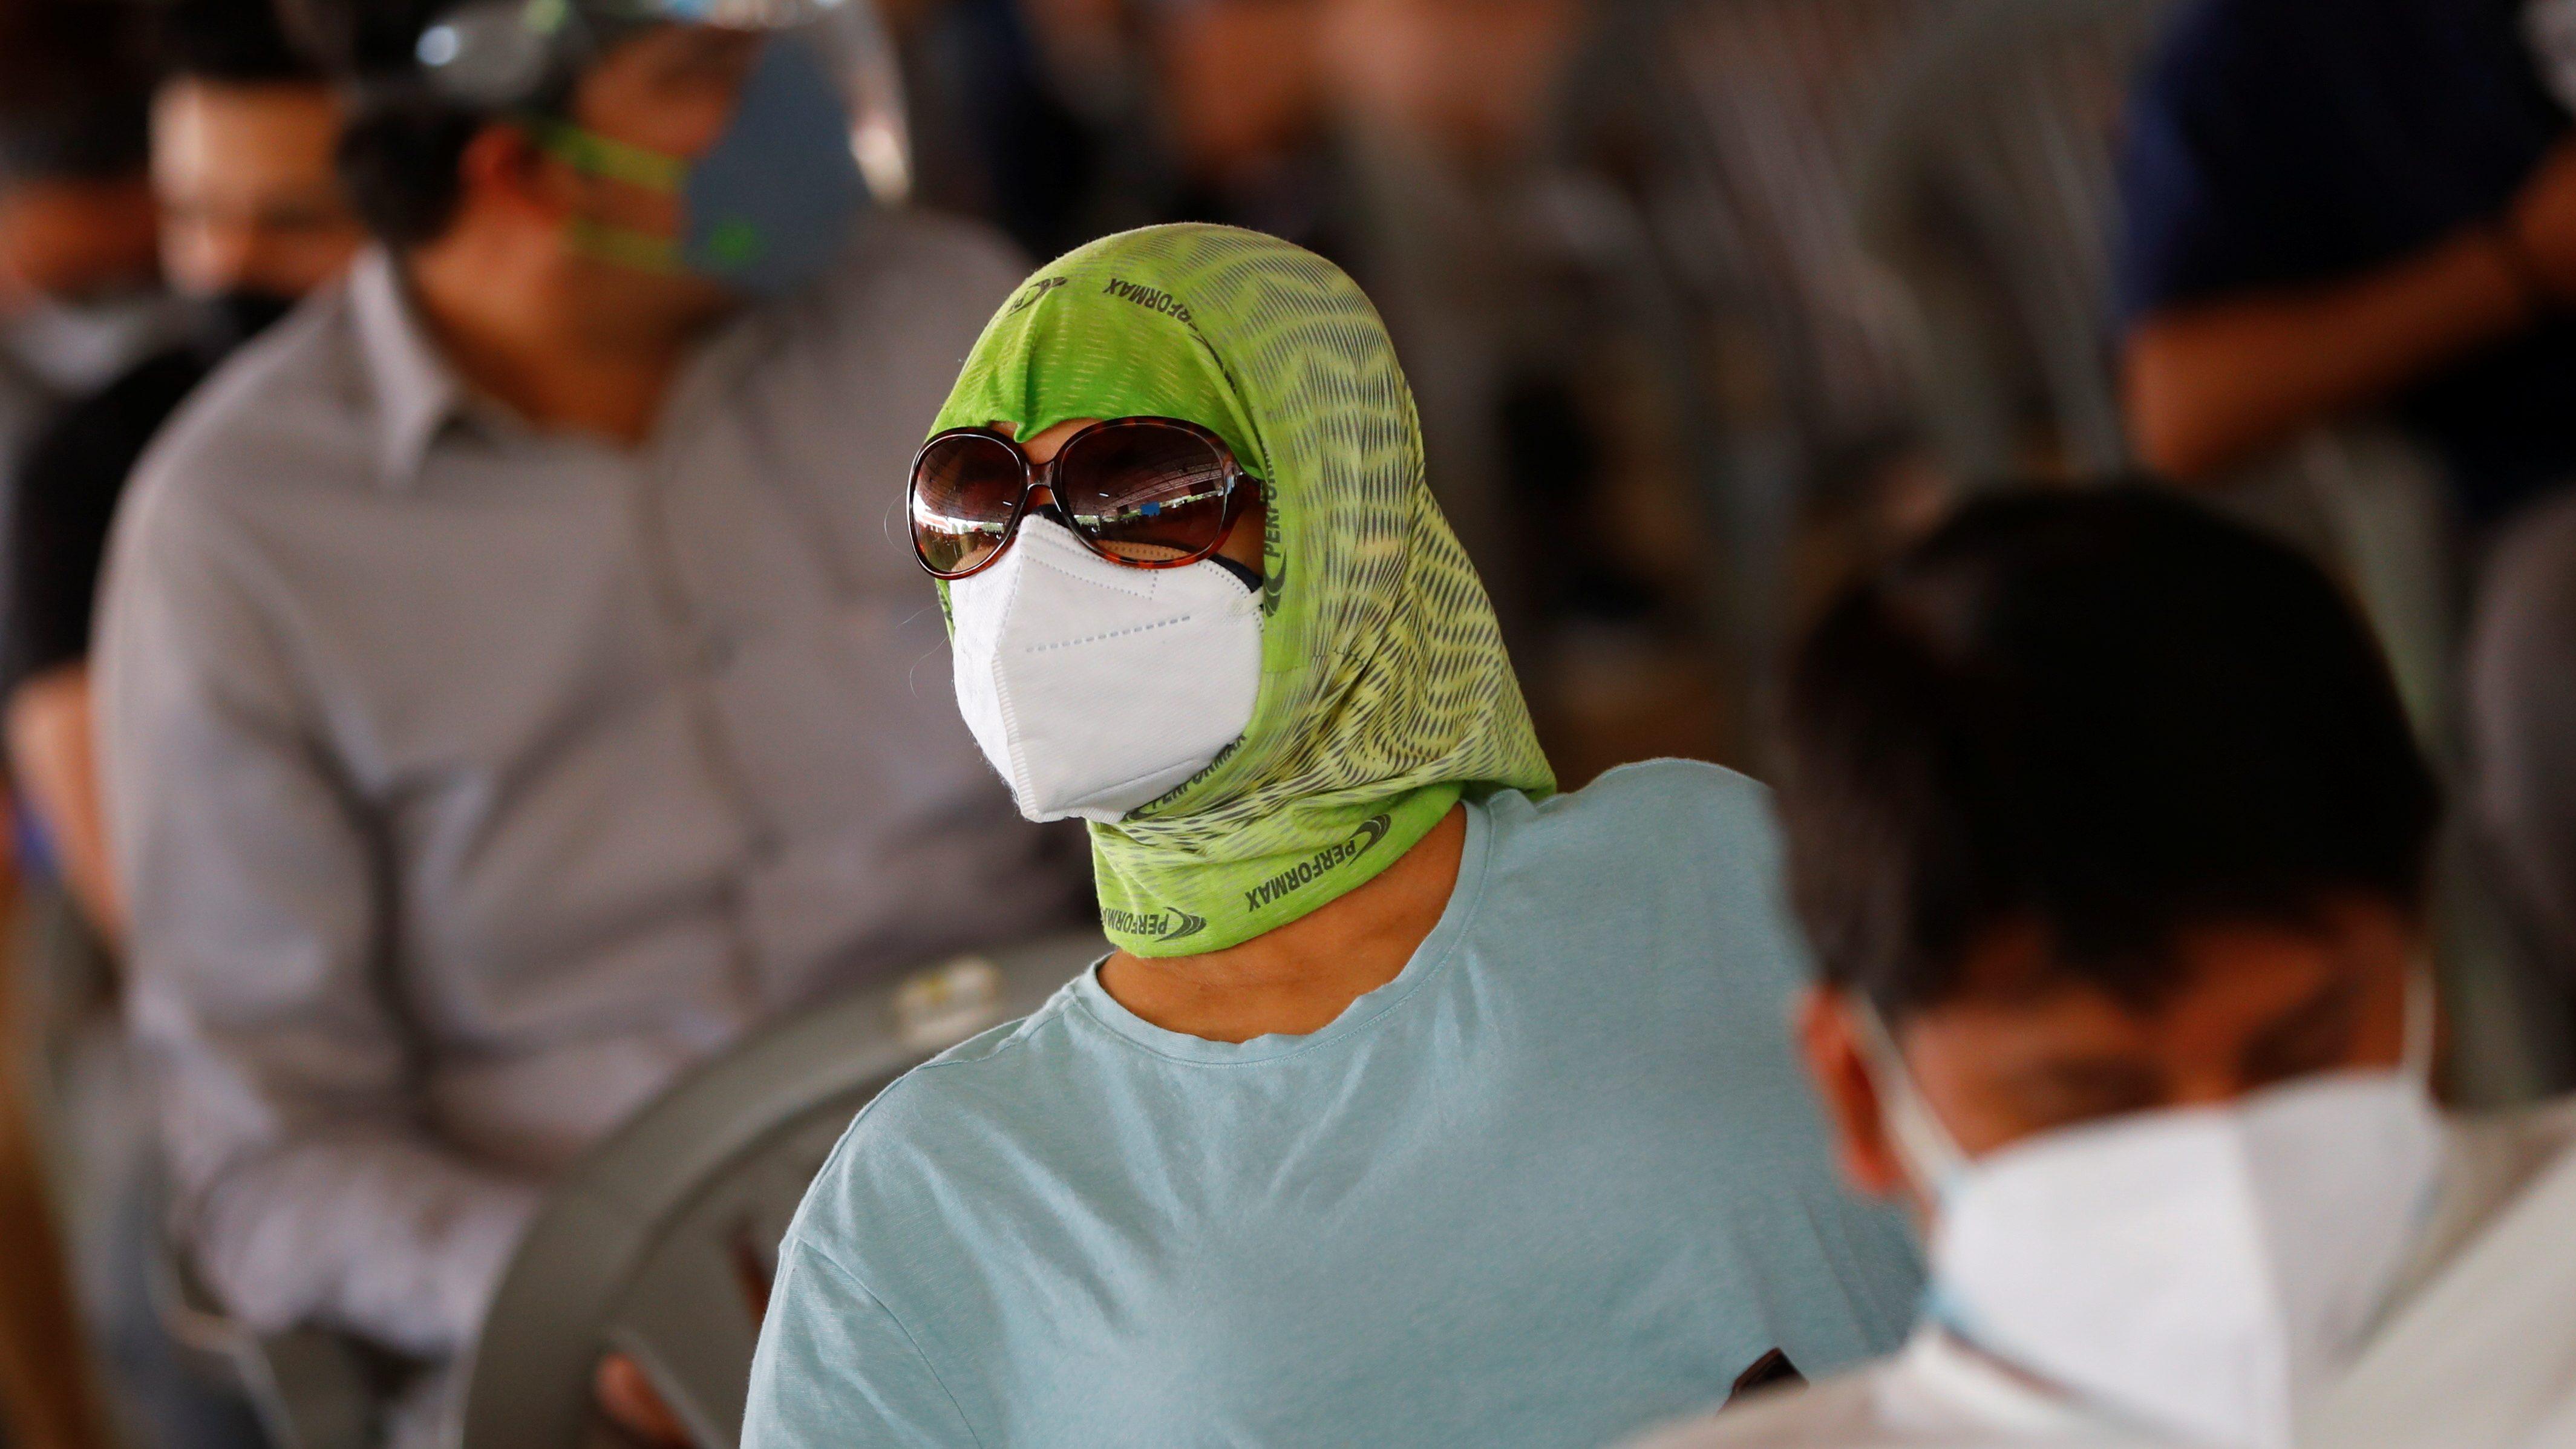 Coronavirus disease (COVID-19) outbreak in New Delhi